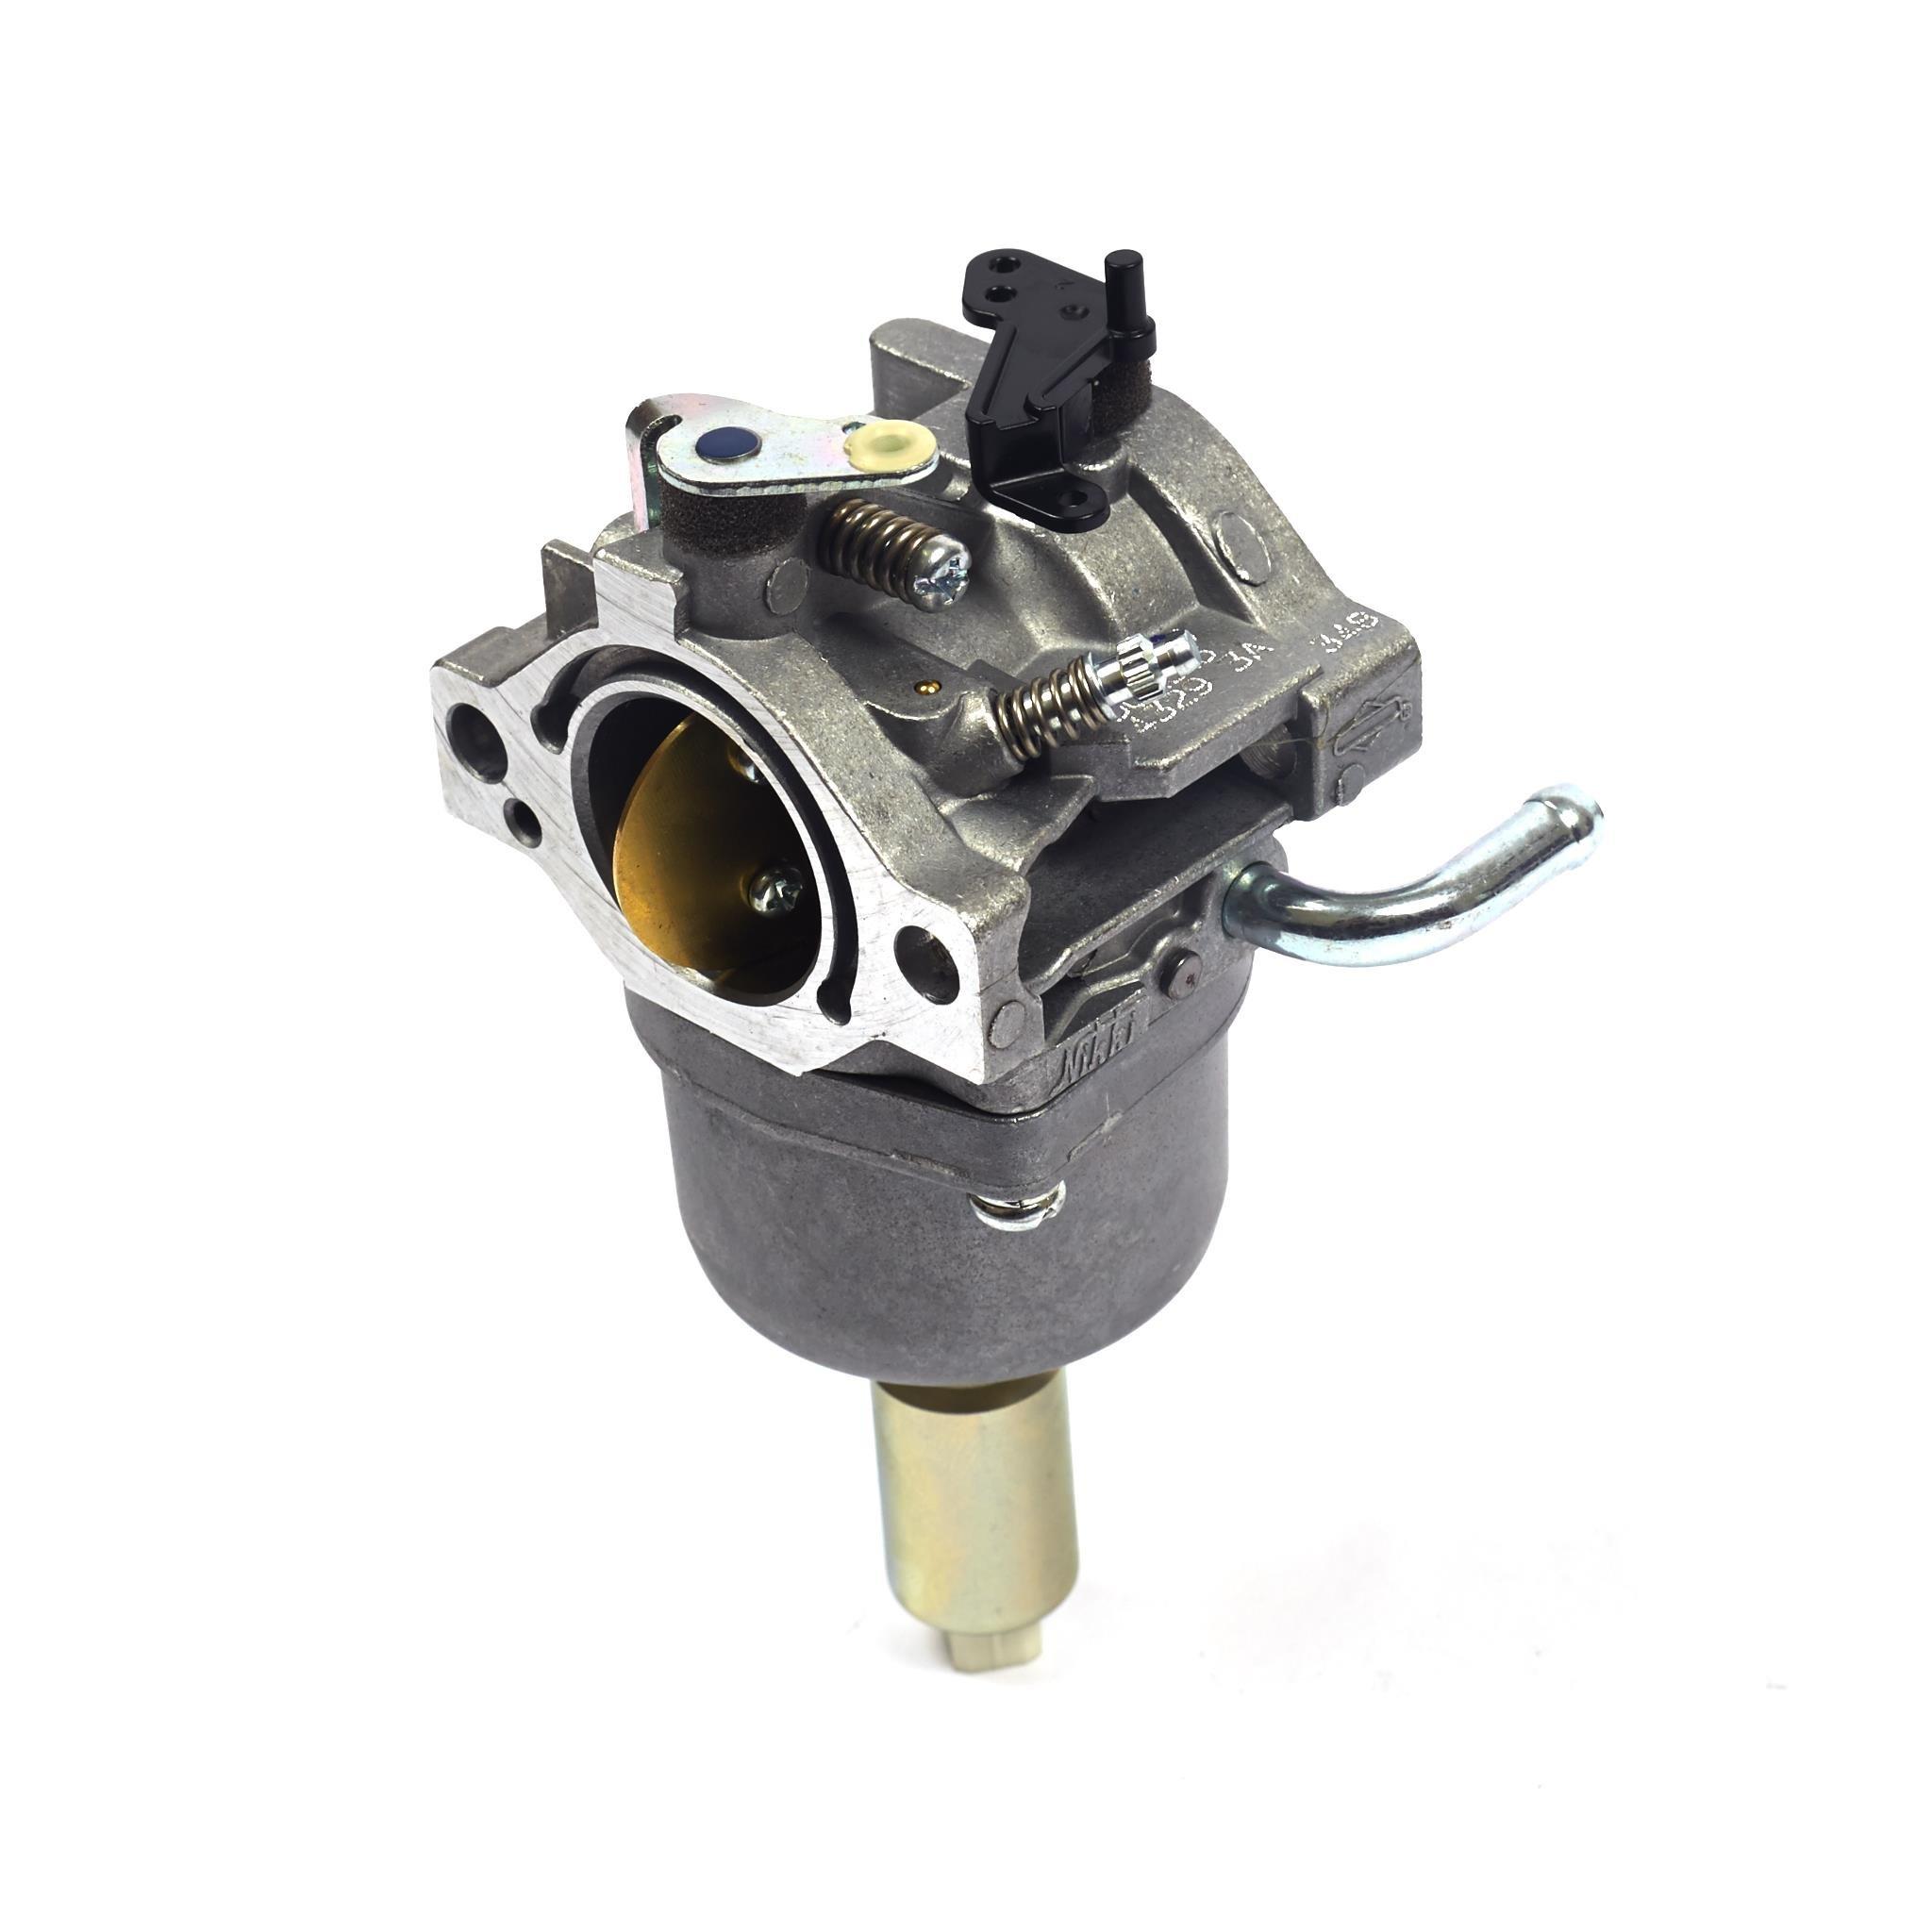 Briggs & Stratton 594601 Carburetor